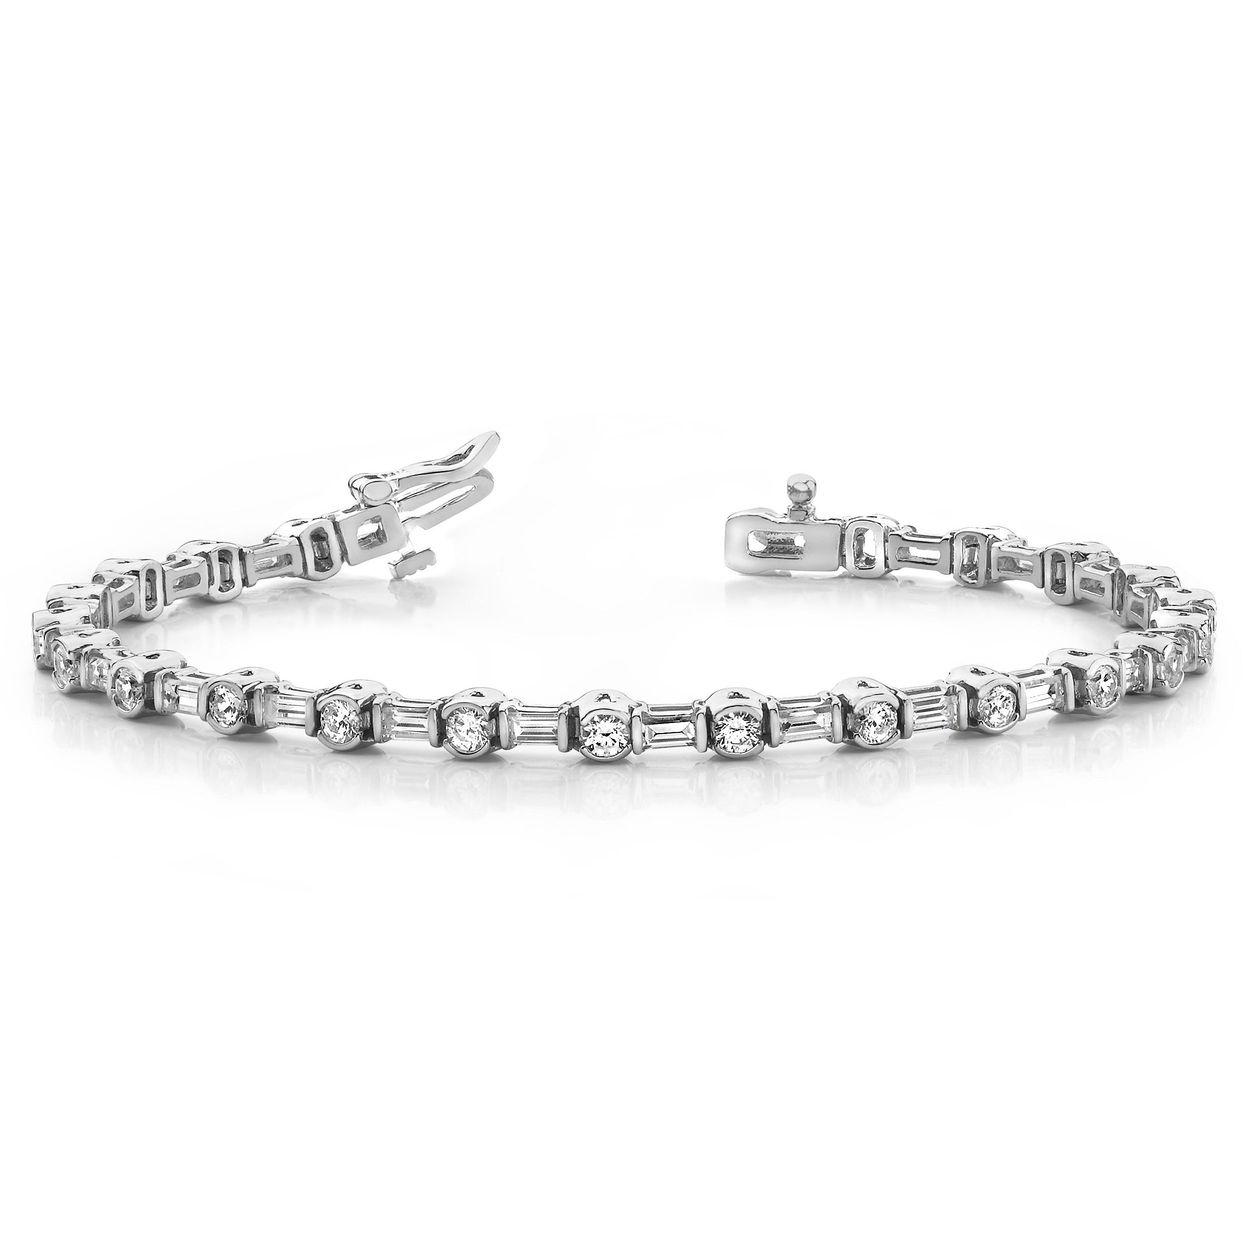 Bracelets For Women Line Tennis Diamond Bracelet Round And Baguette Shape